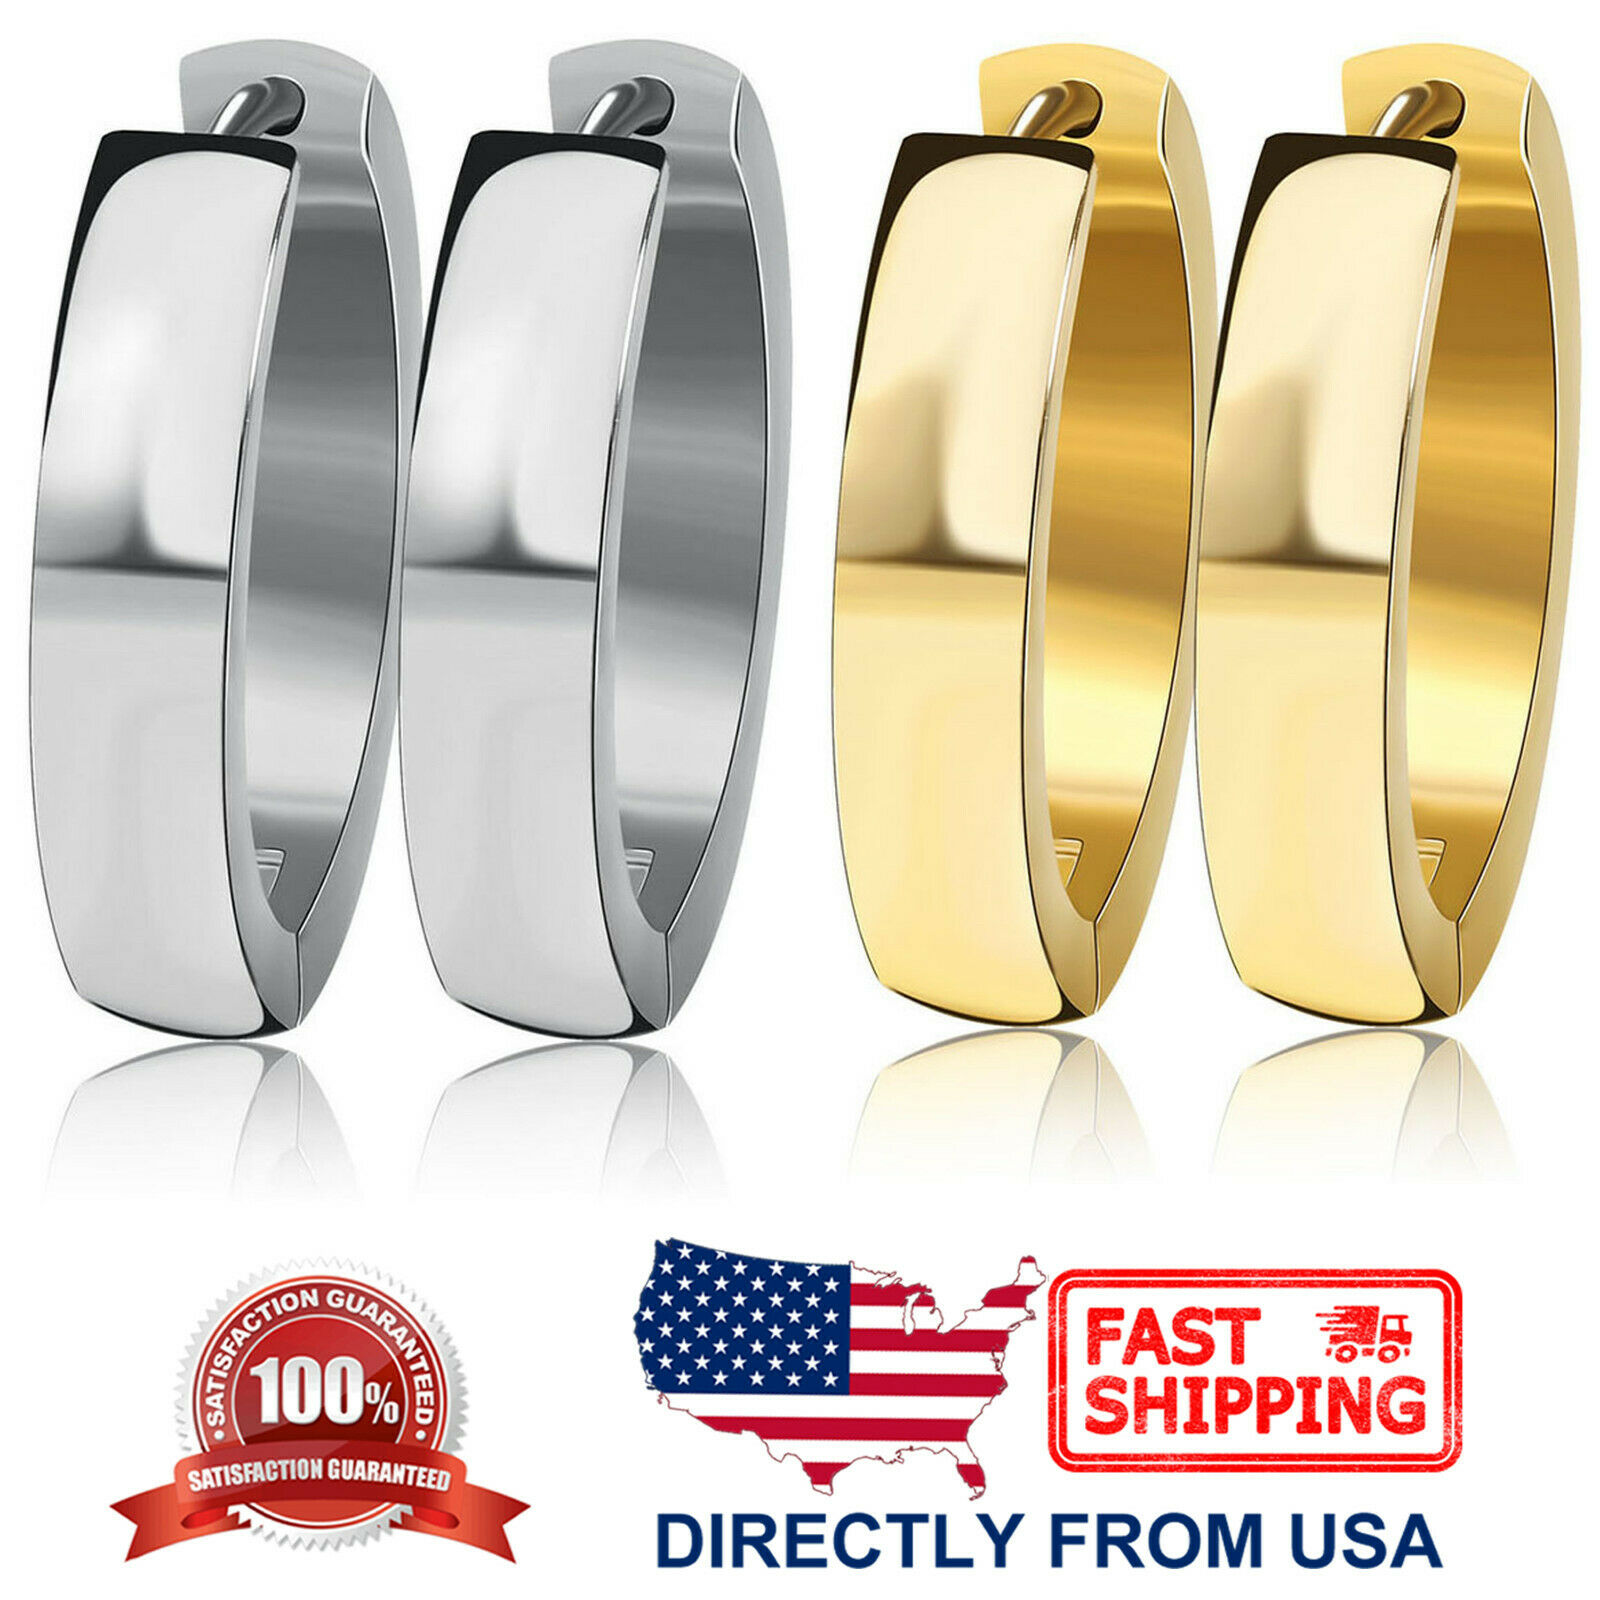 Women's Stainless Steel Oval Polished 4mm Hoop Huggie Earrings (Gold or Silver) Earrings